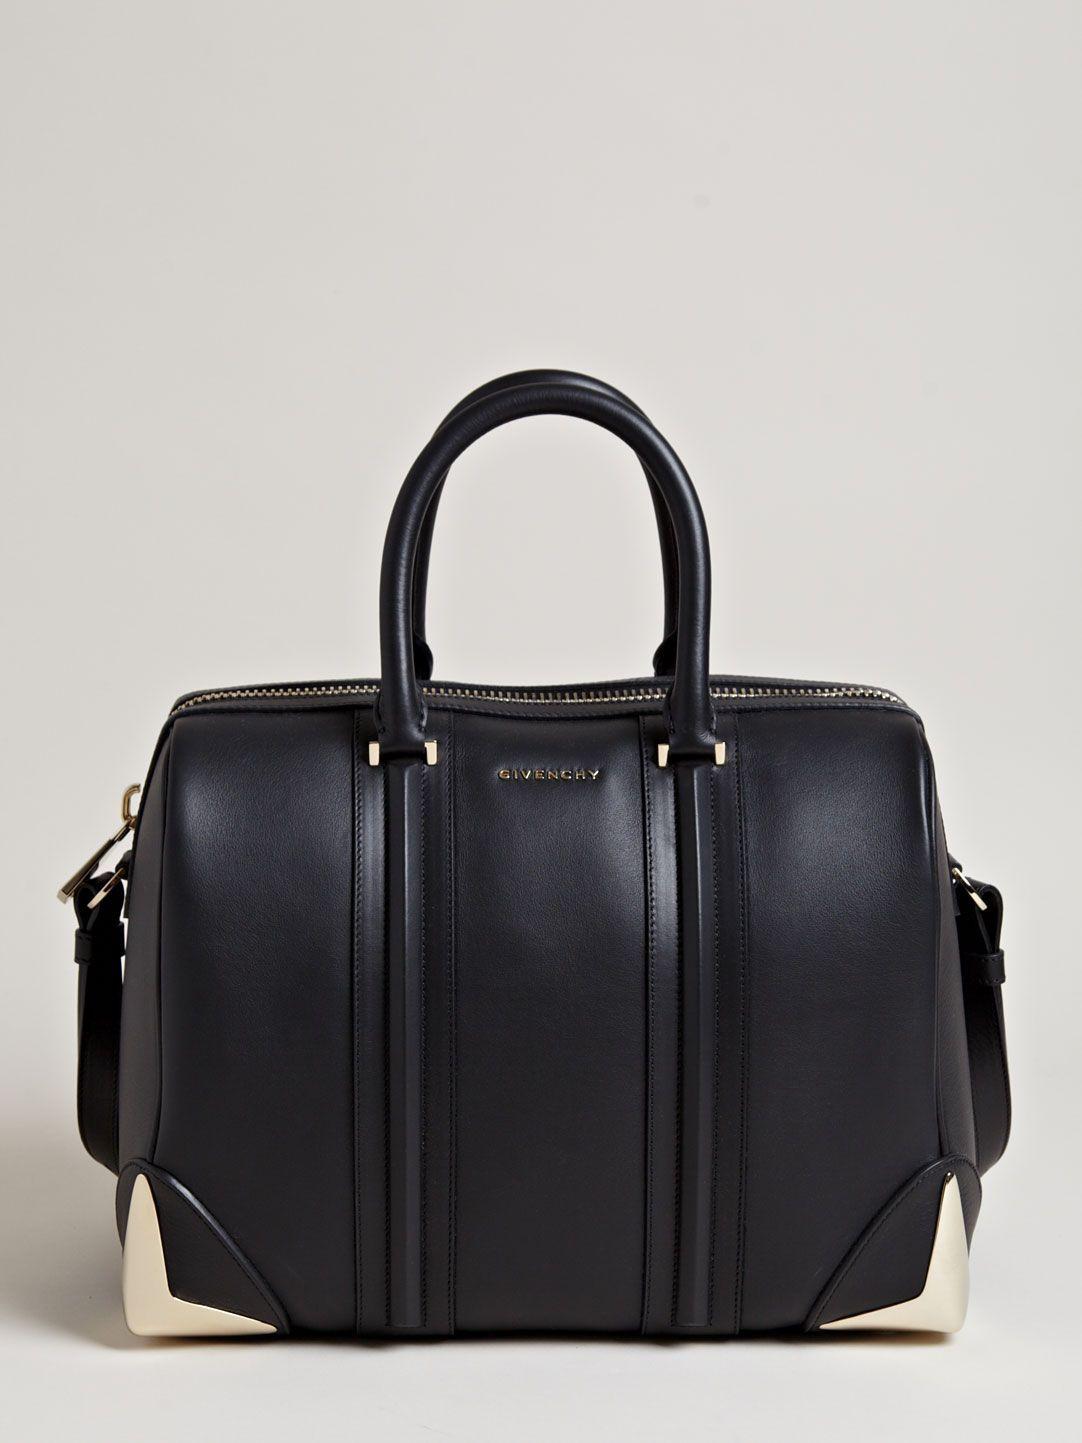 f480c2352115 Givenchy Women s Large Lucrezia Bag